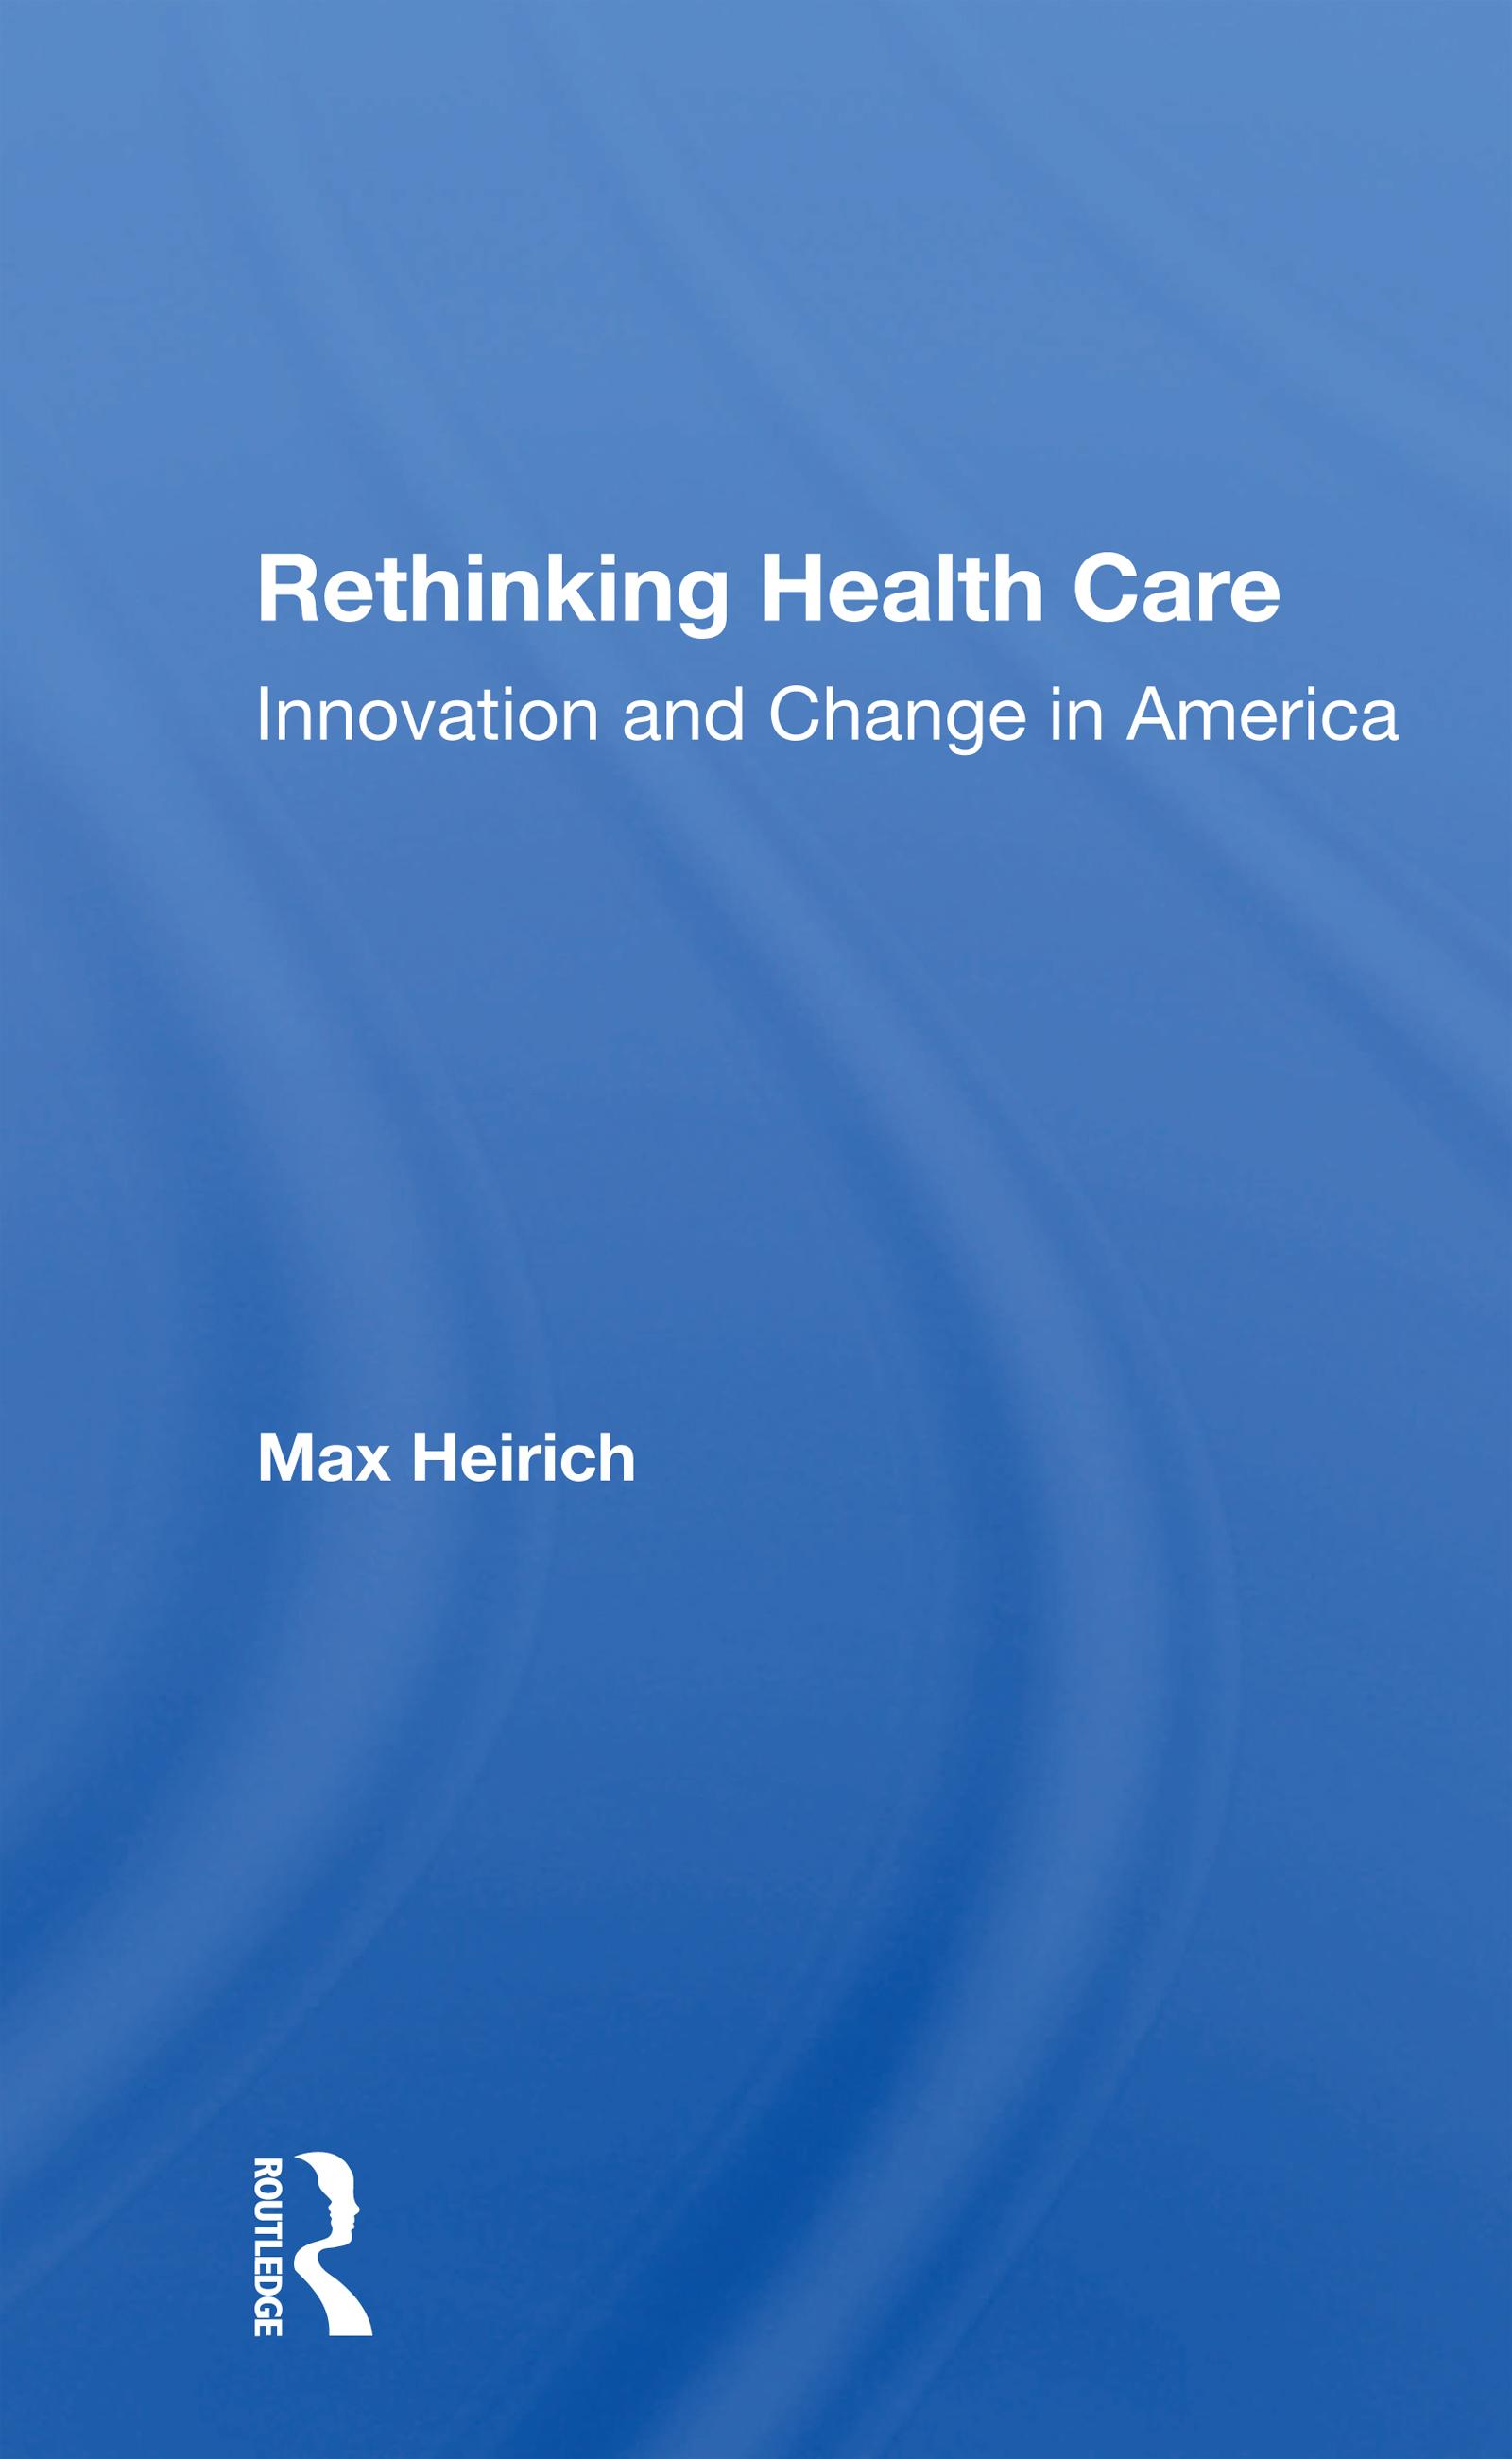 Rethinking Health Care